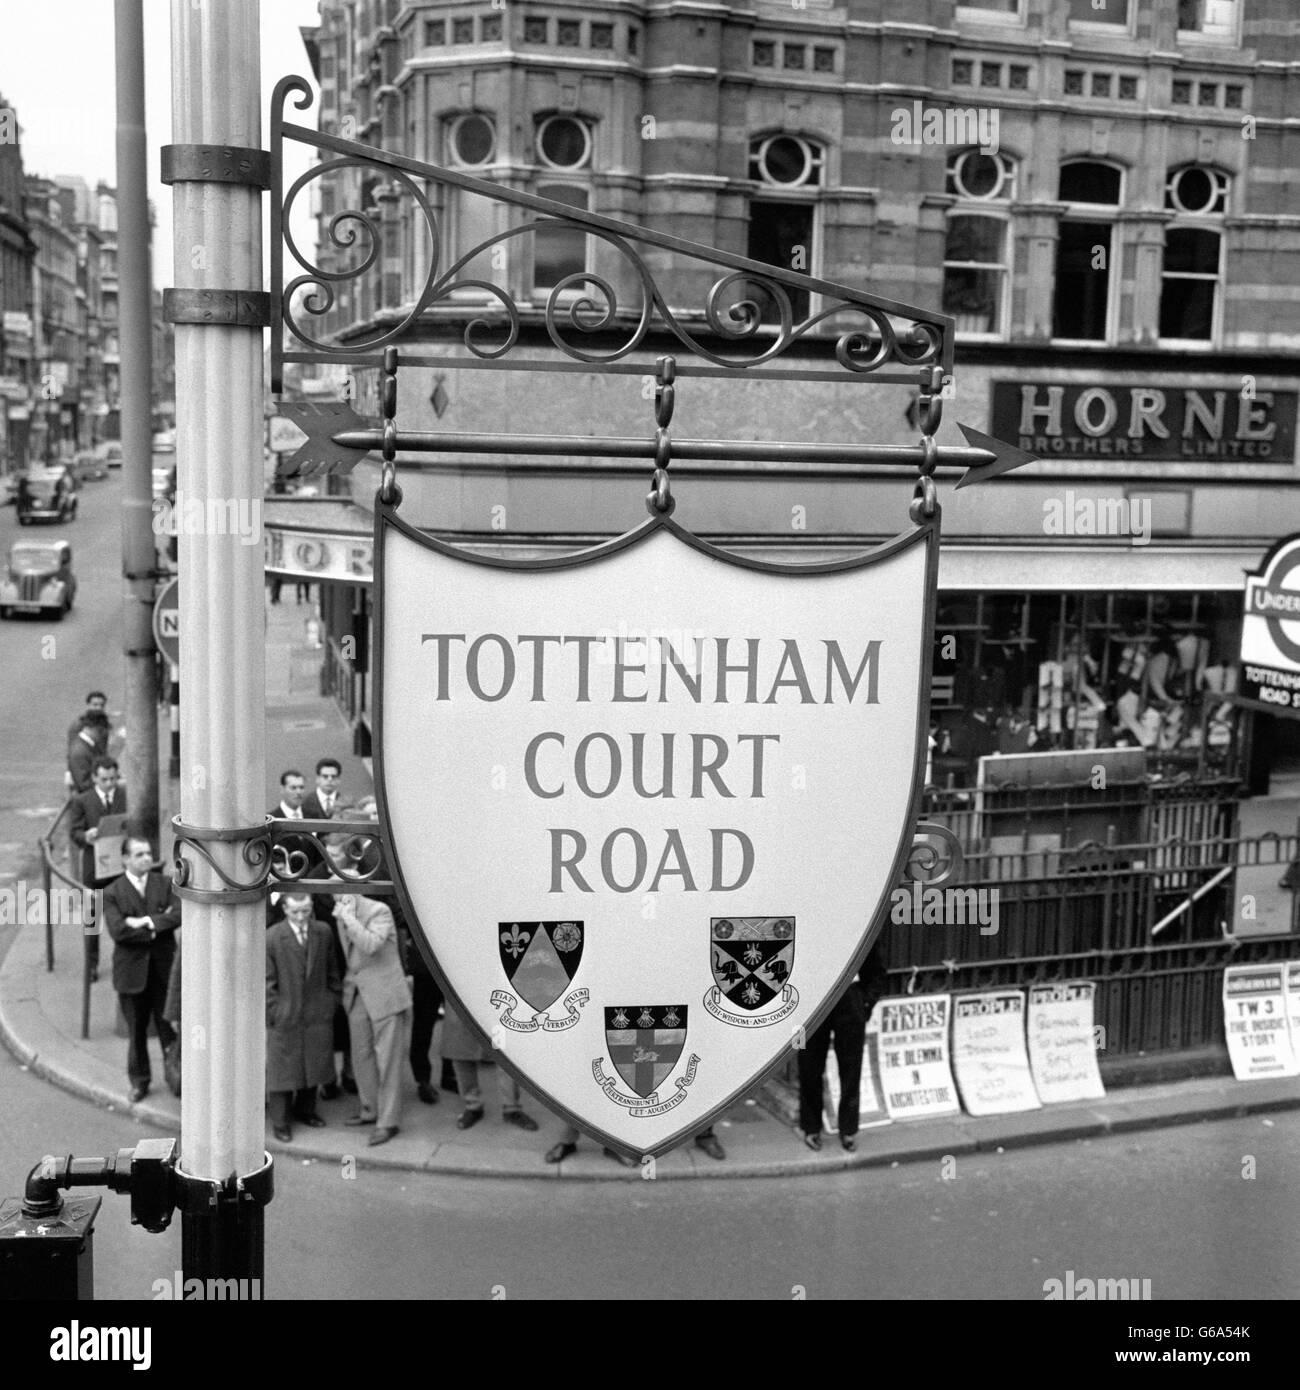 London Scenes - Tottenham Court Road - 1963 - Stock Image